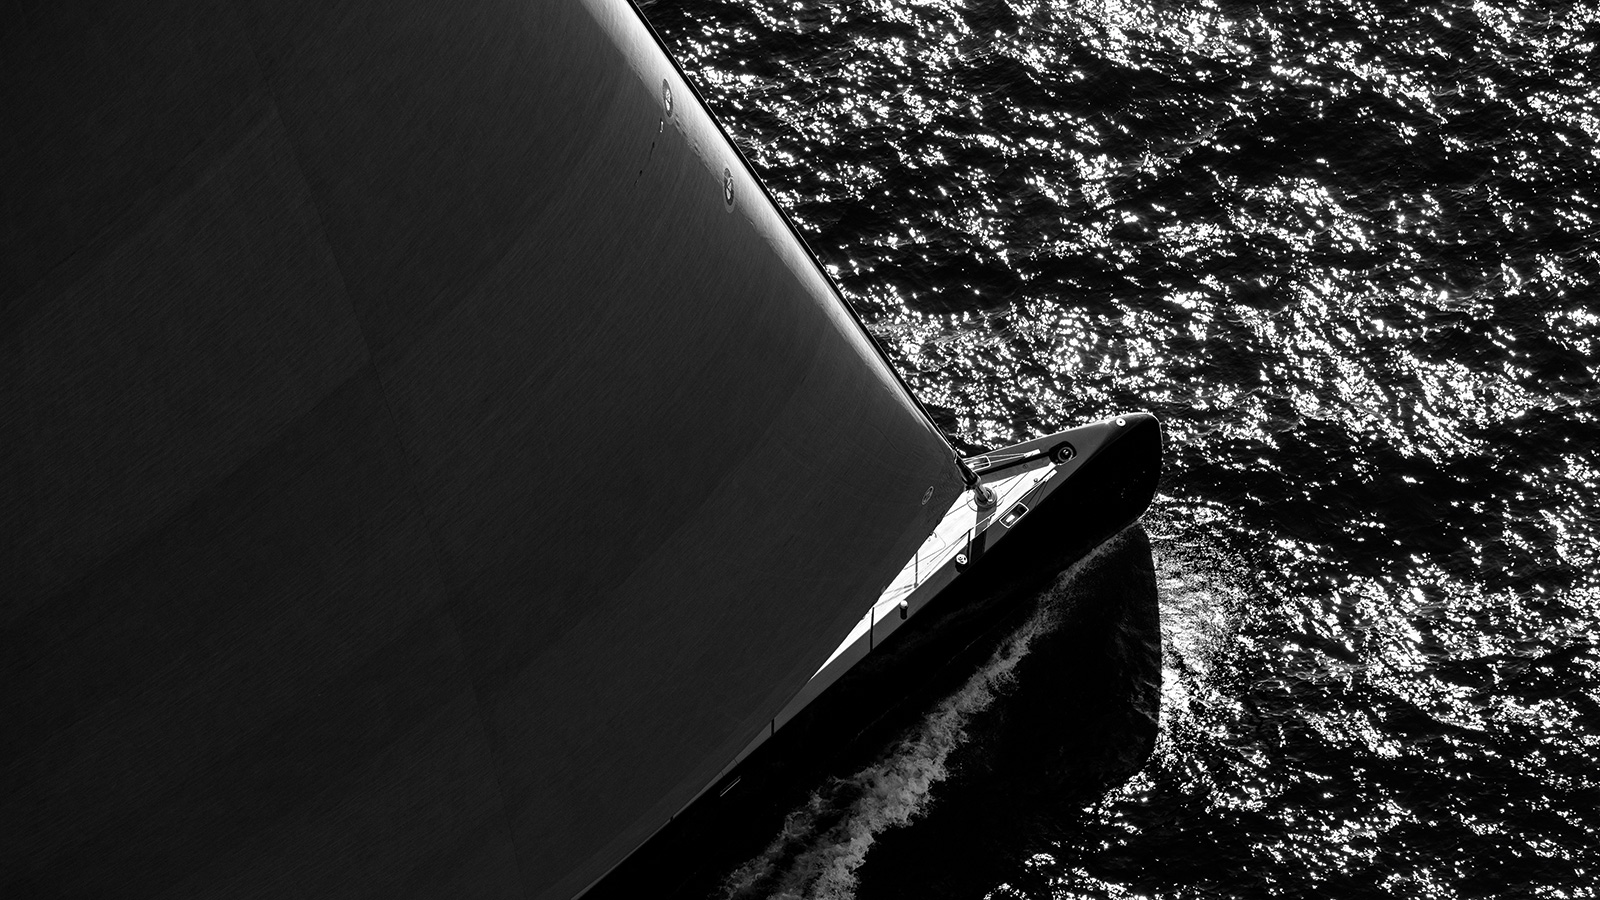 the-bow-of-the-royal-huisman-sailing-yacht-ngoni-credit-jeff-brown-breed-media